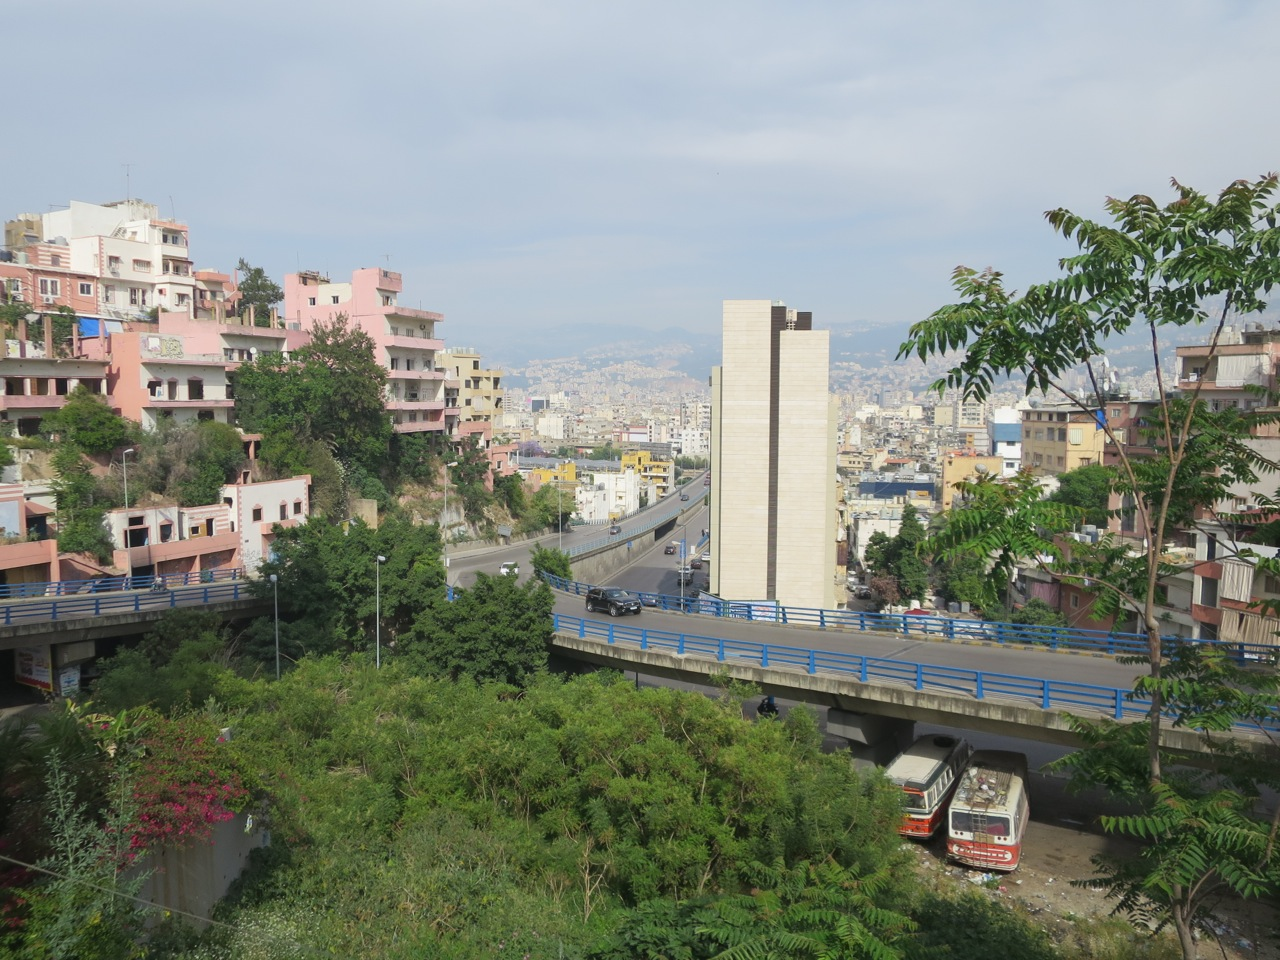 Beirute 2-15